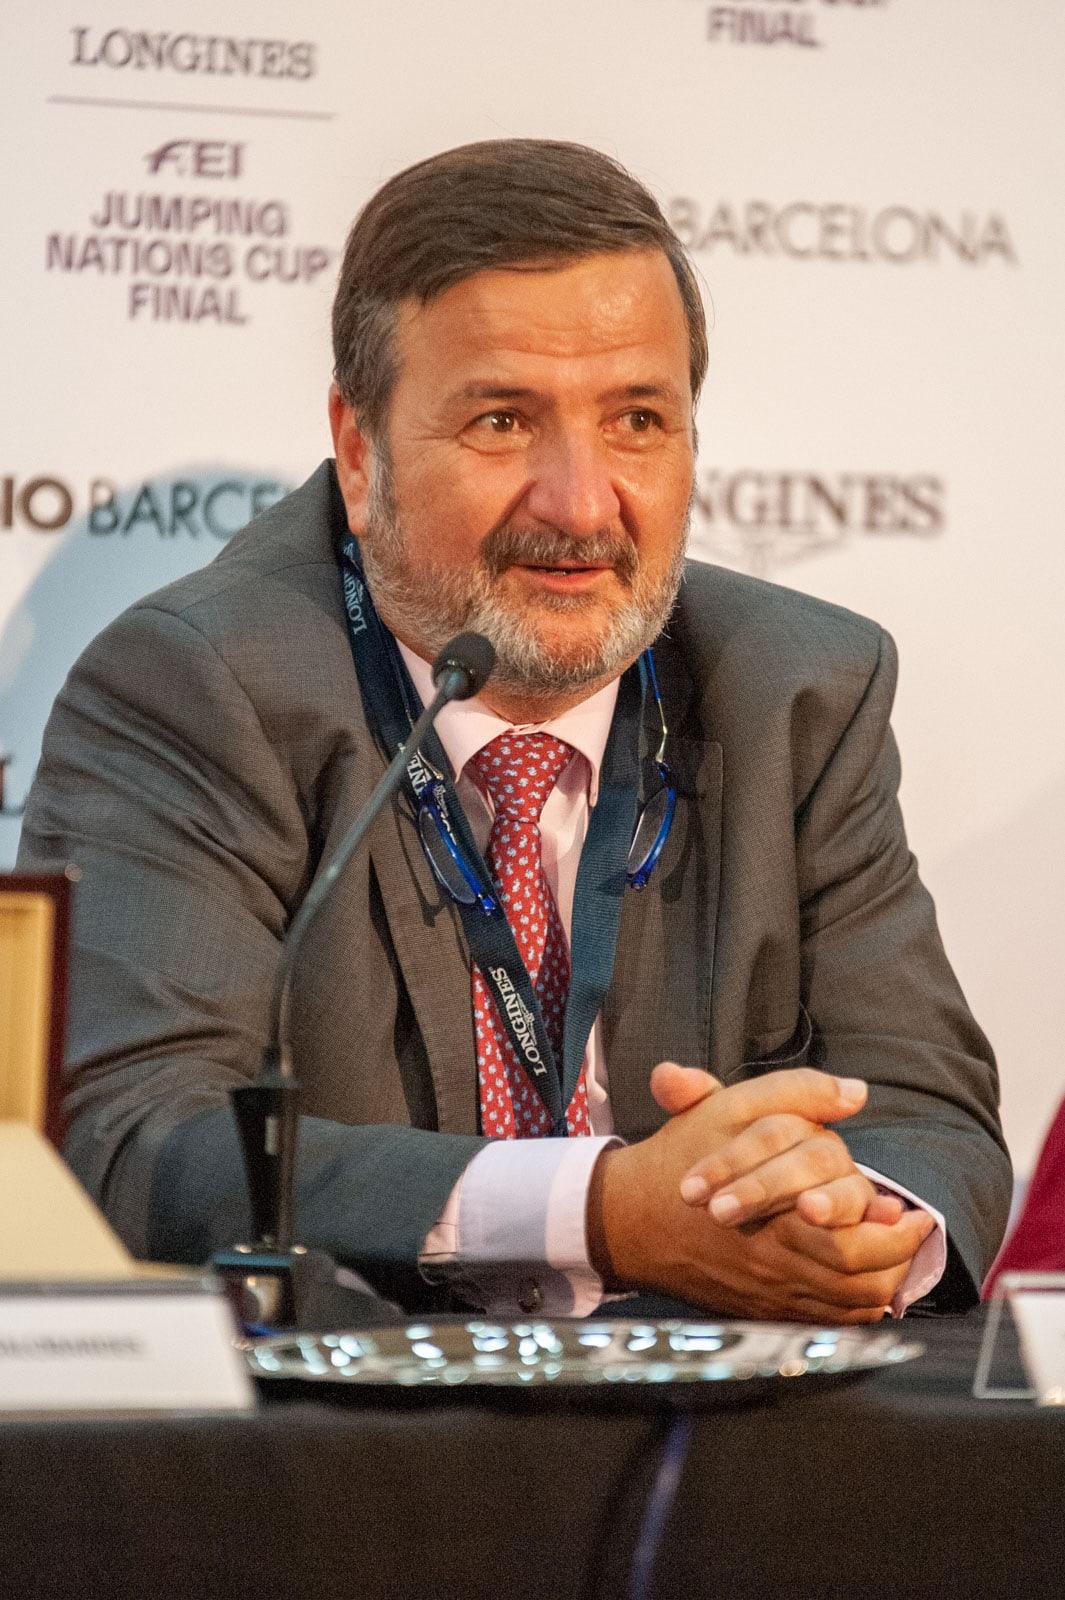 Santiago Varela